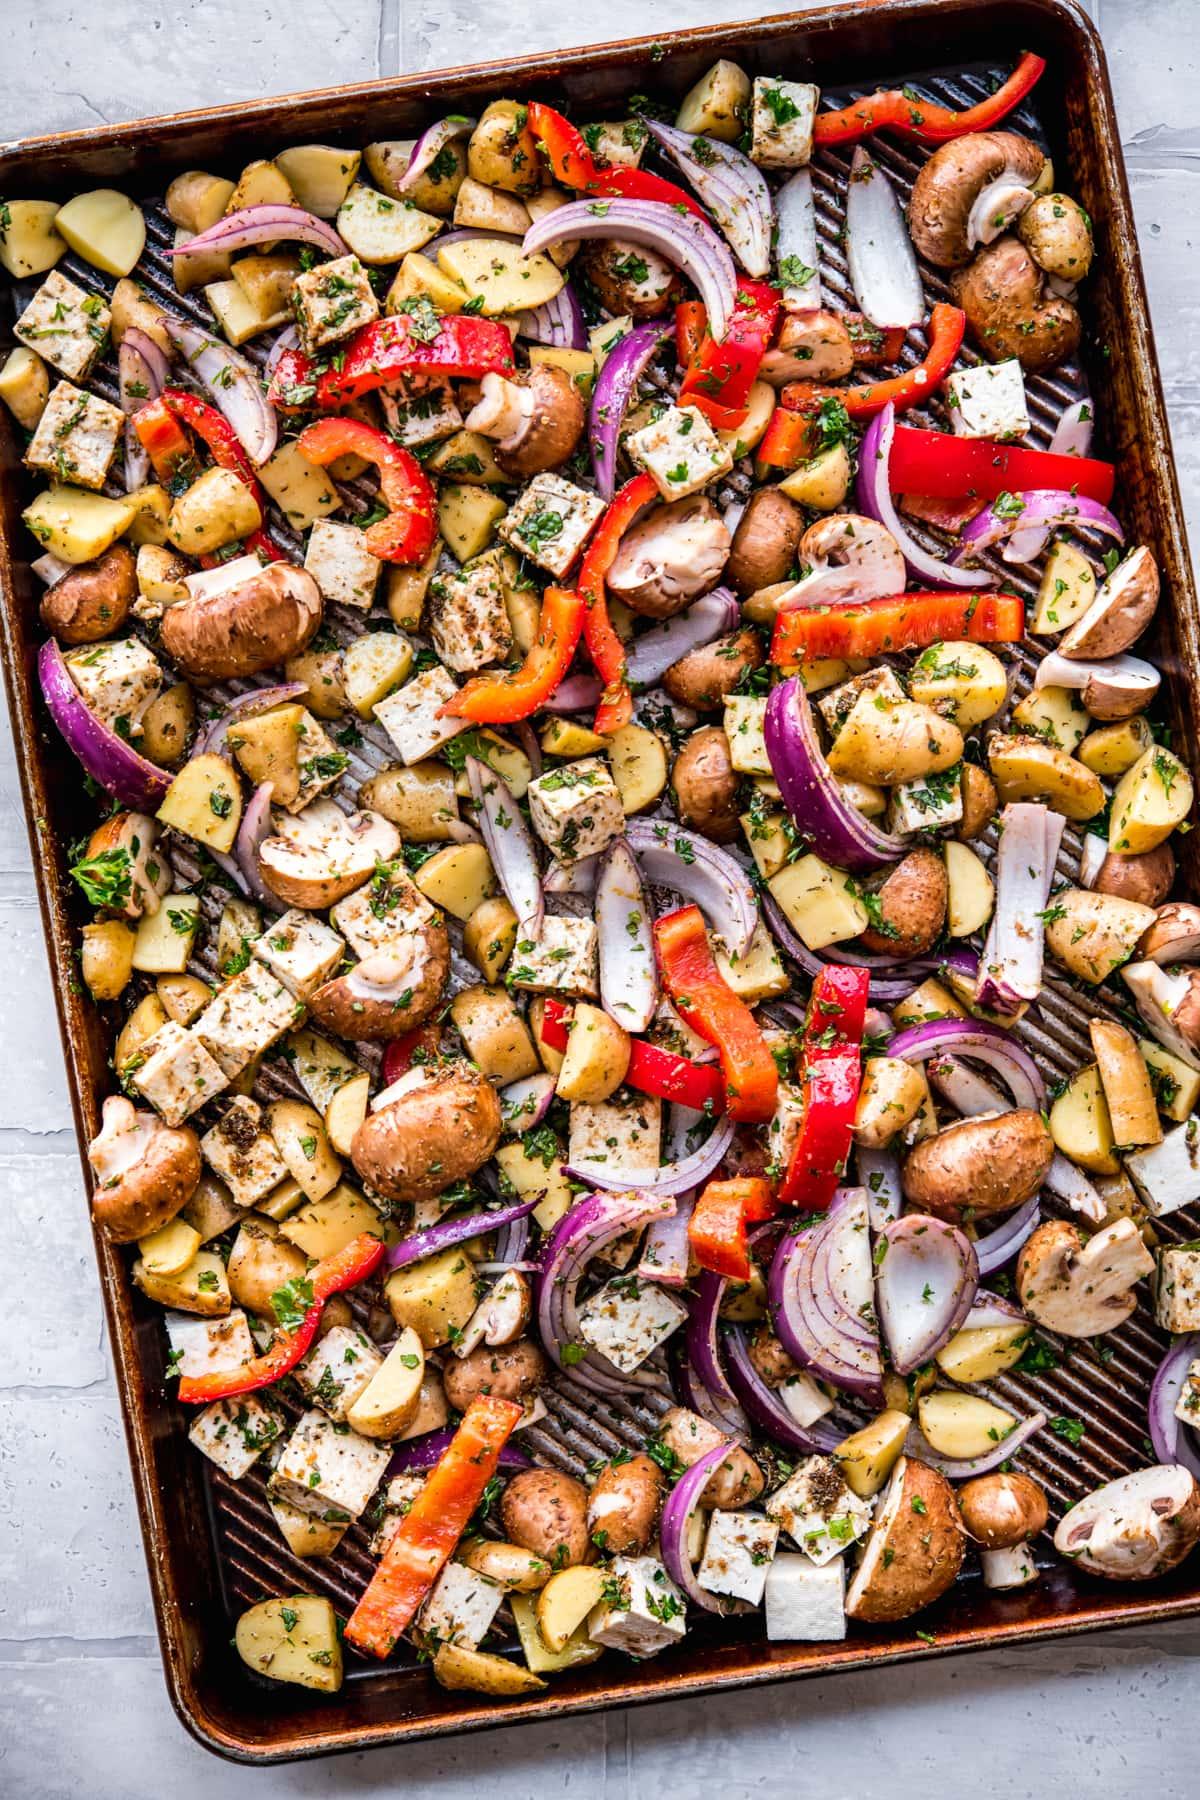 overhead view of vegan mediterranean sheet pan dinner with tofu and vegetables before roasting.